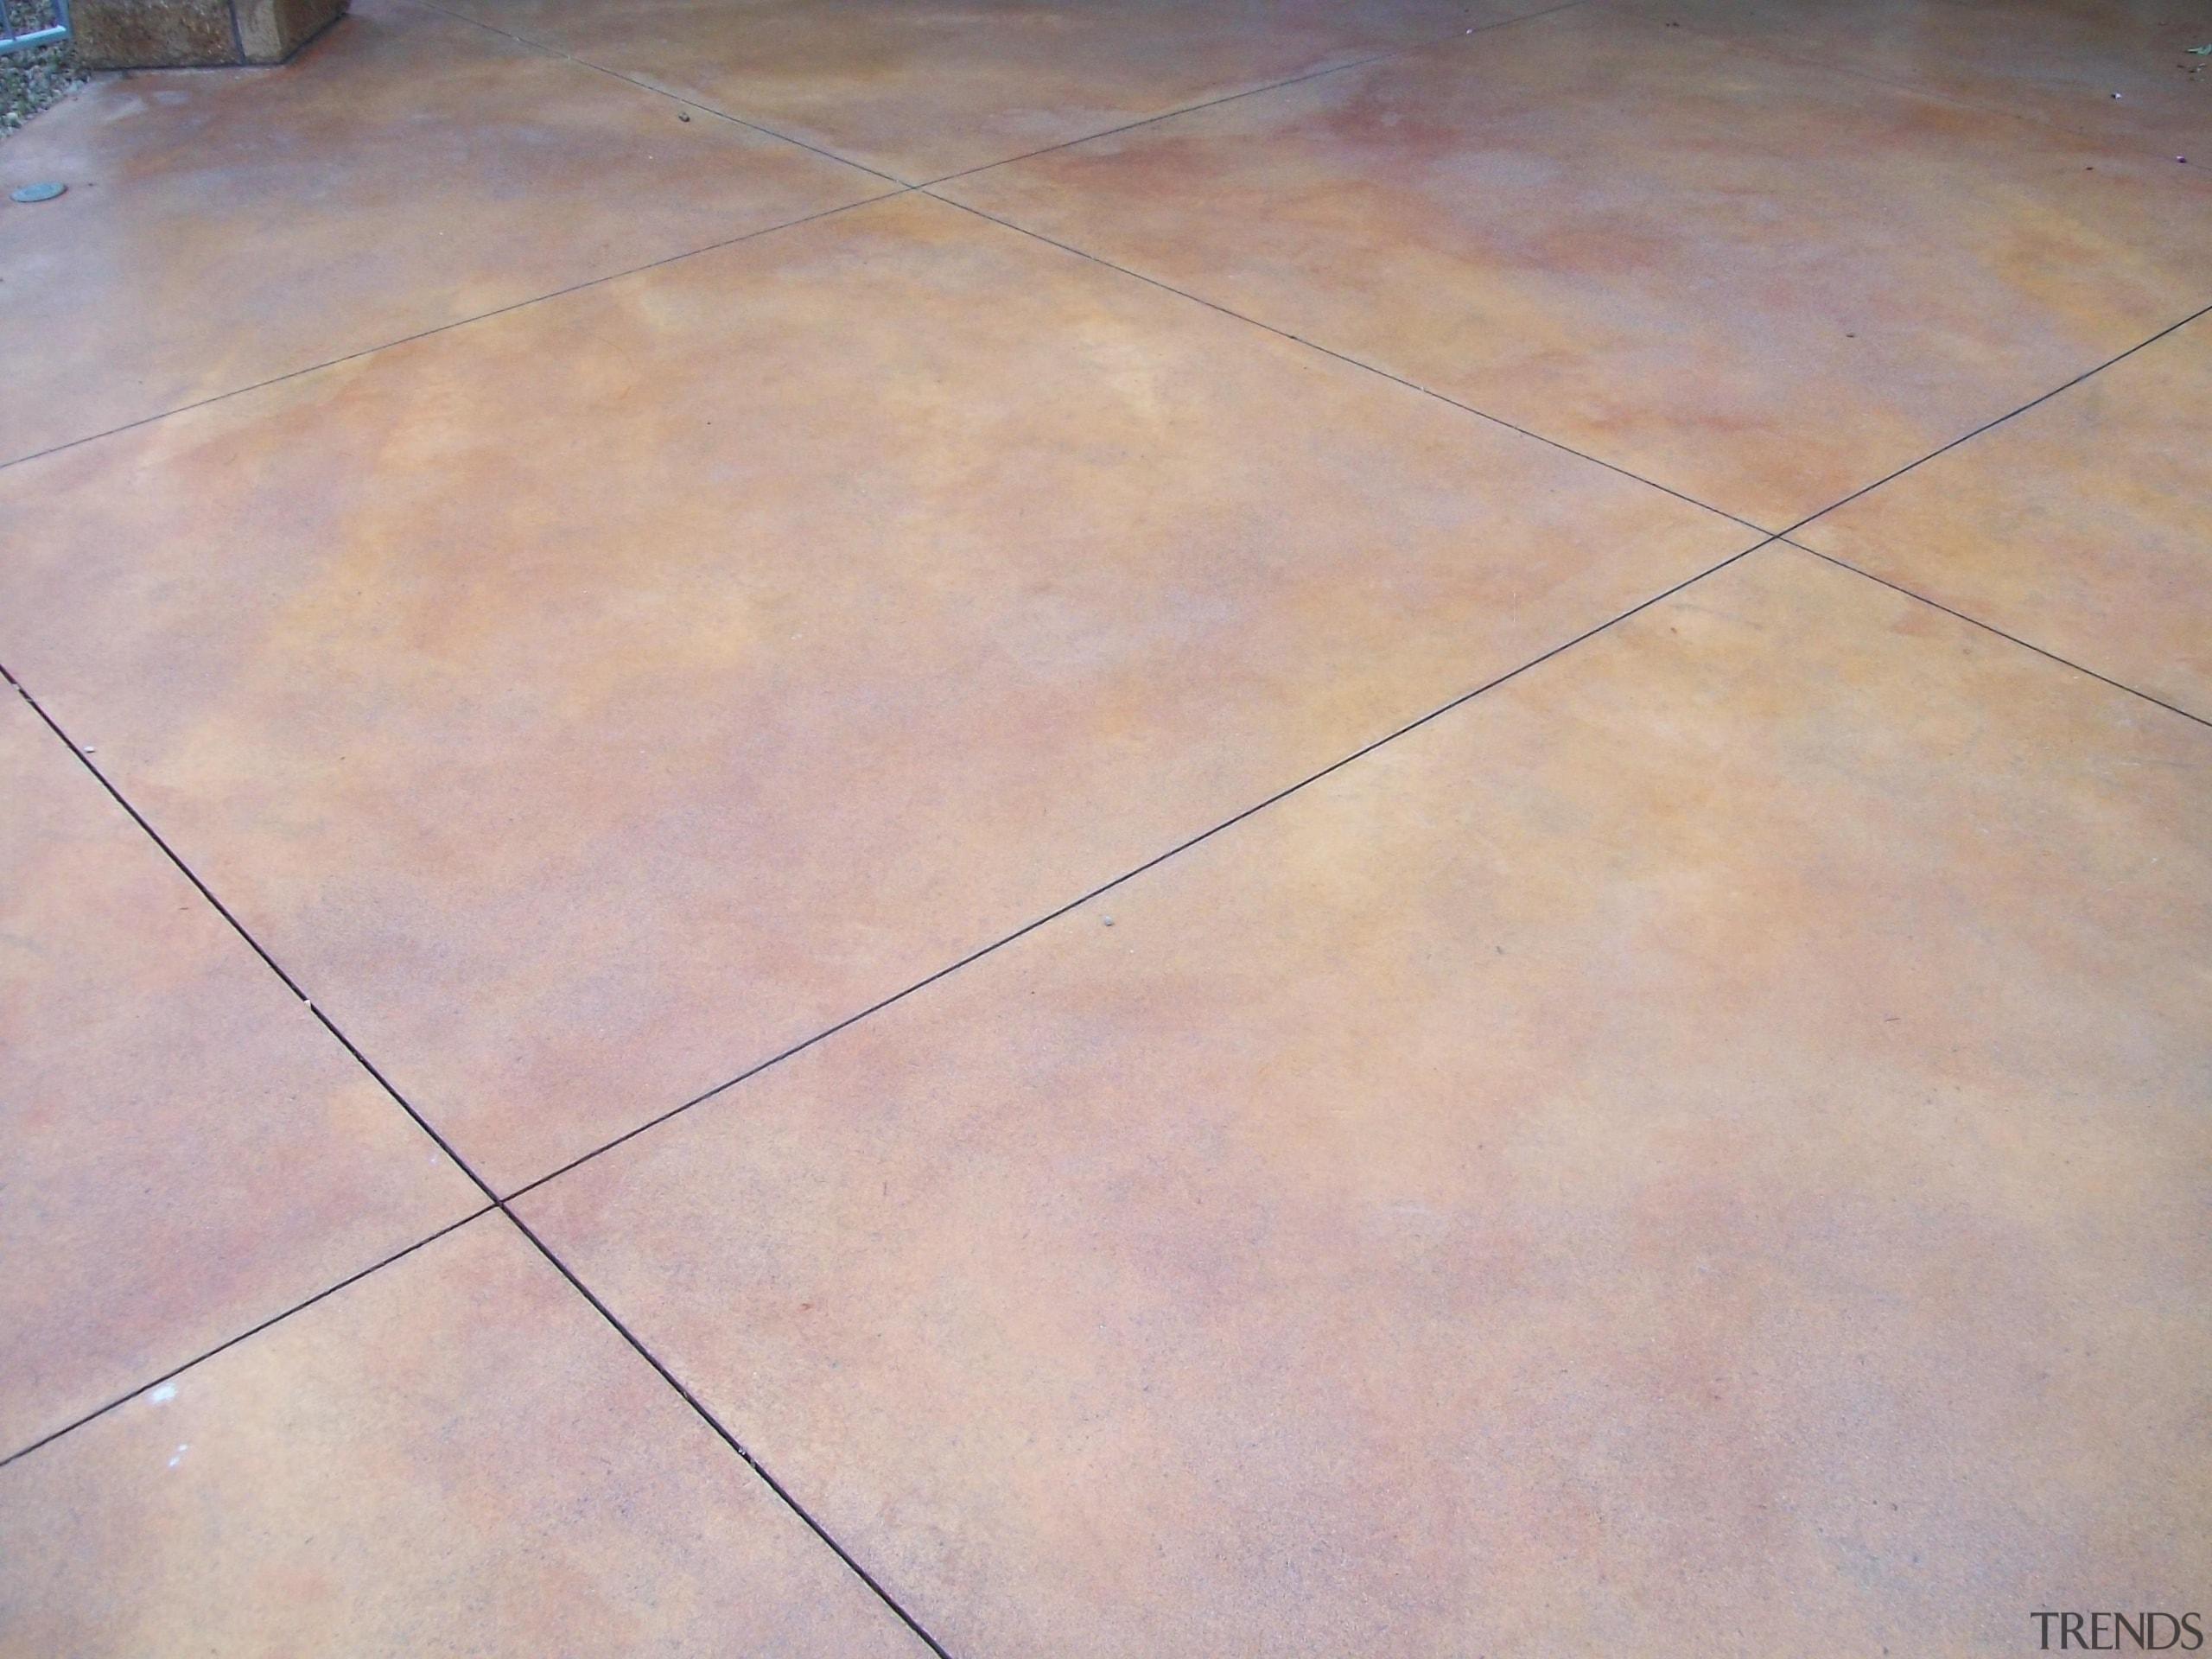 Colourmix 24 - Colourmix_24 - concrete   floor concrete, floor, flooring, hardwood, line, material, tile, wood, wood stain, gray